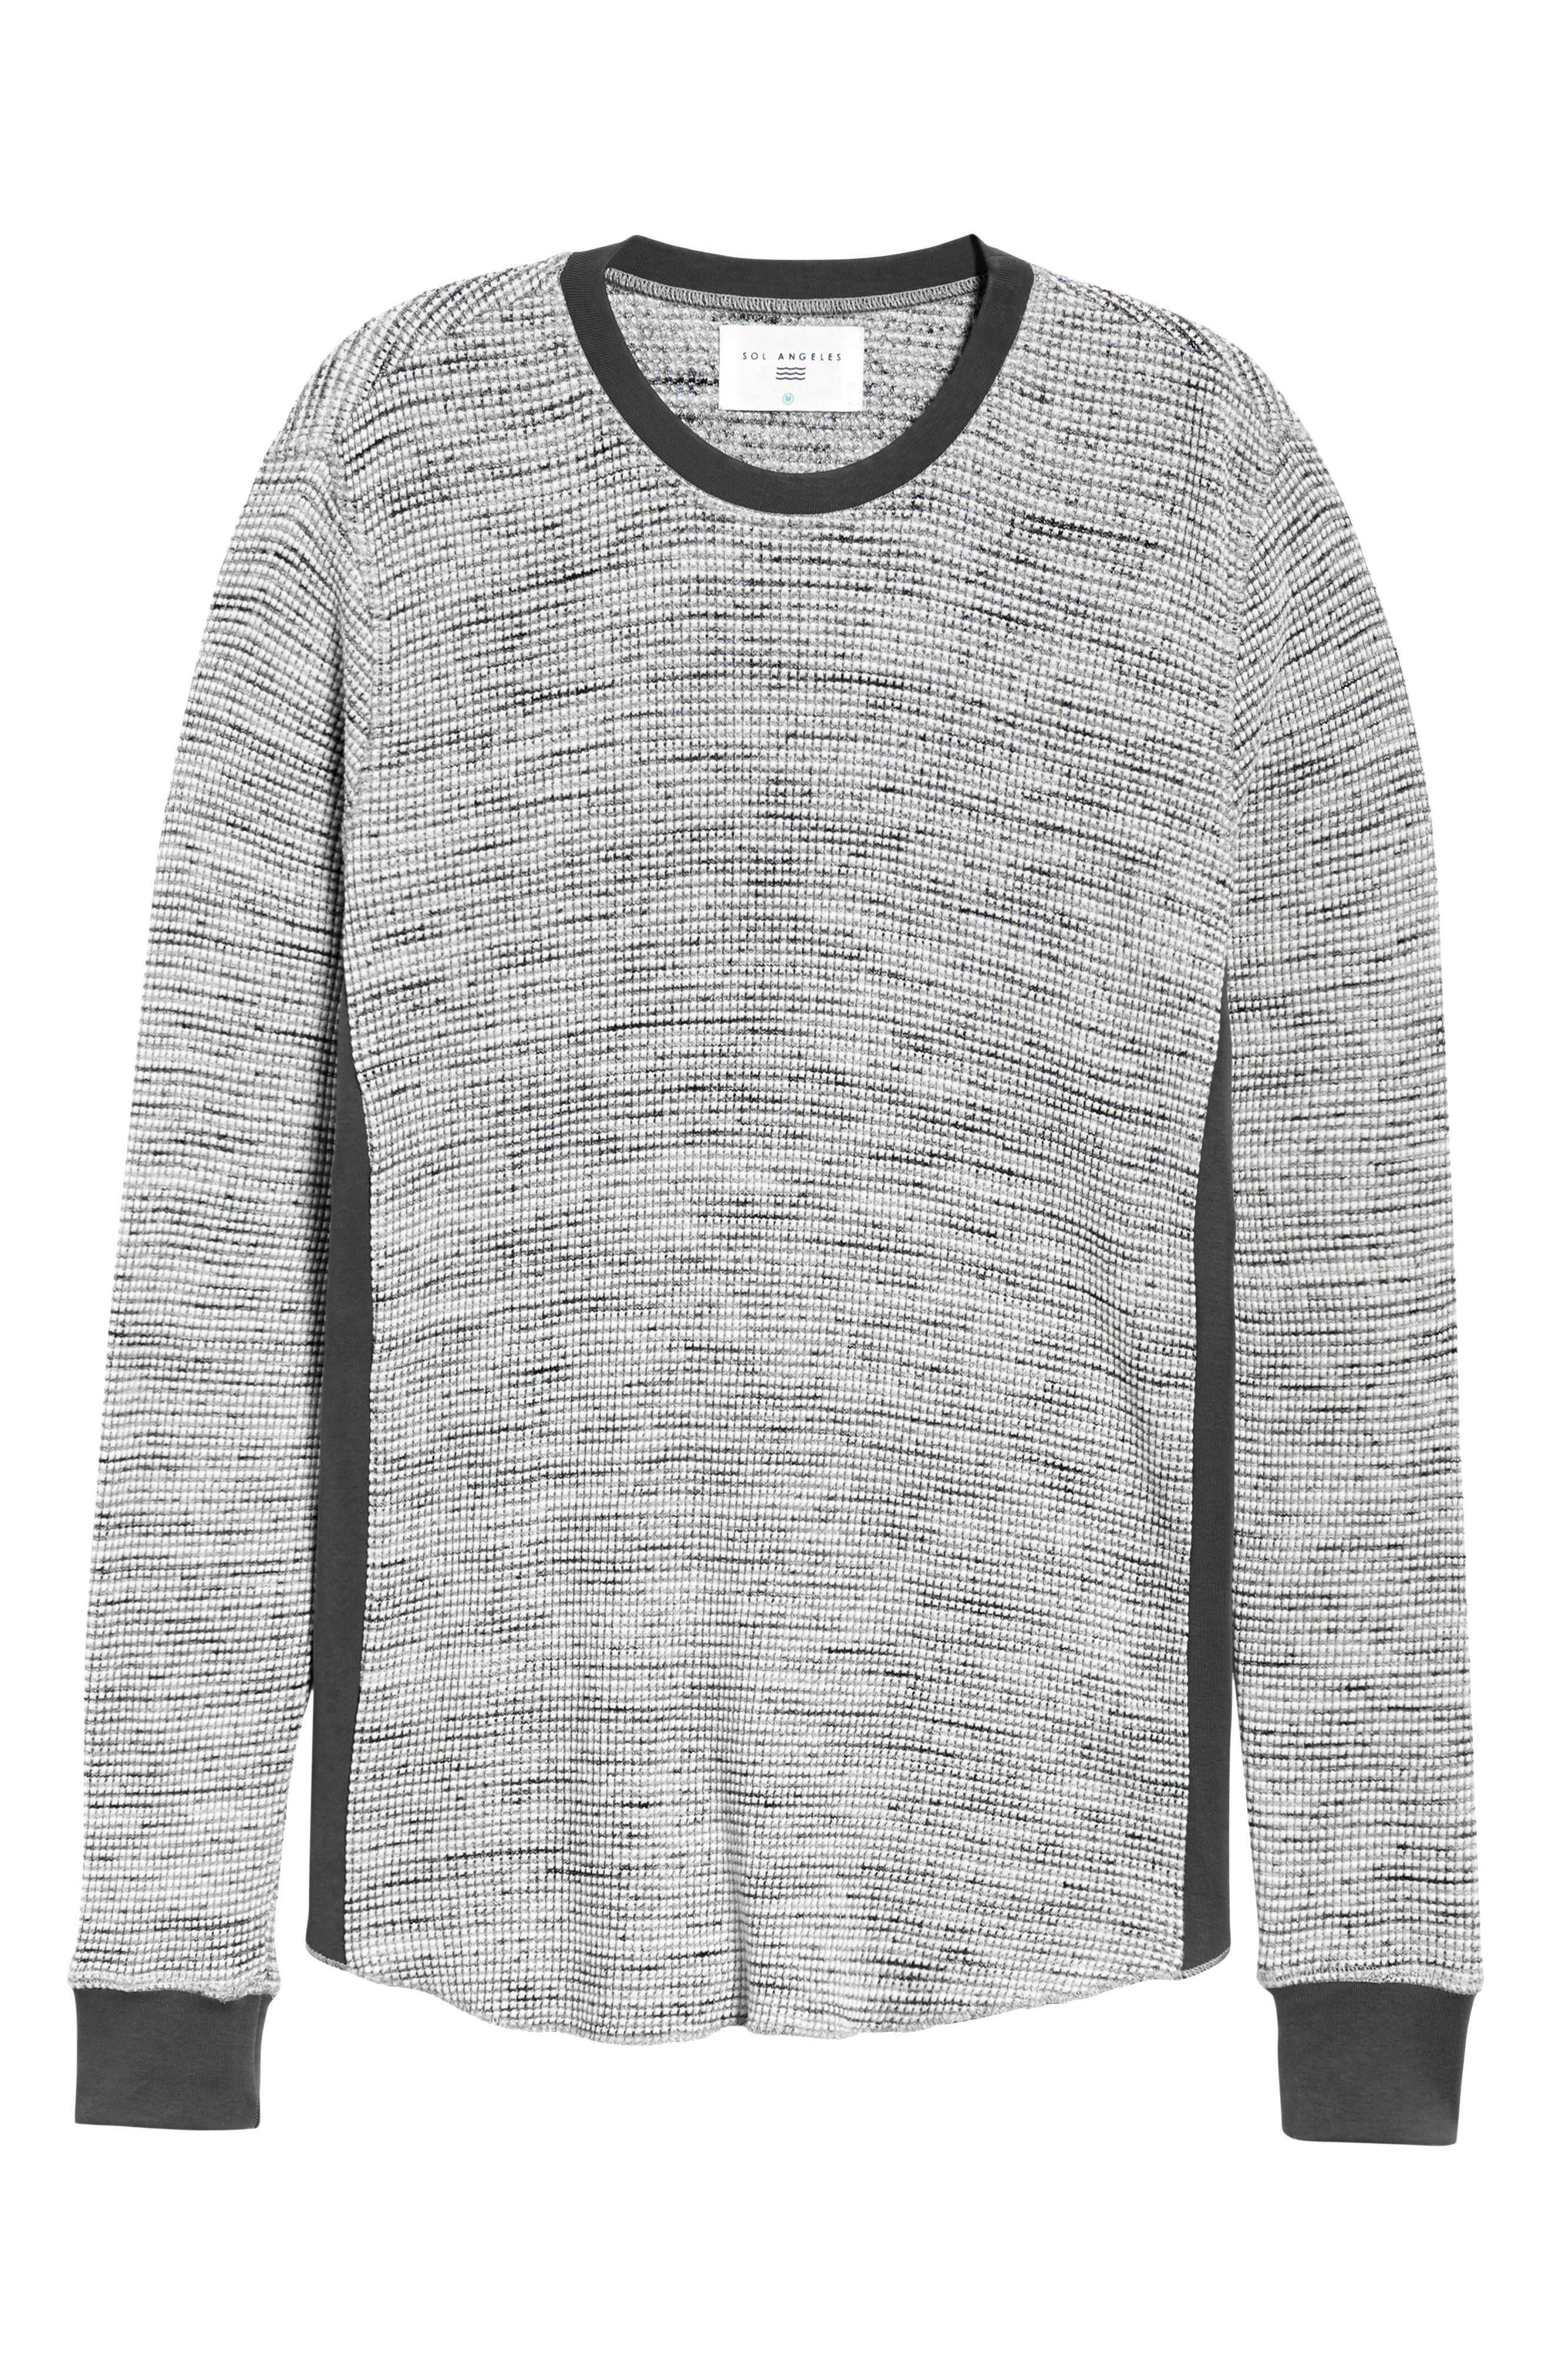 Neps Longline Thermal Shirt,                             Alternate thumbnail 6, color,                             020